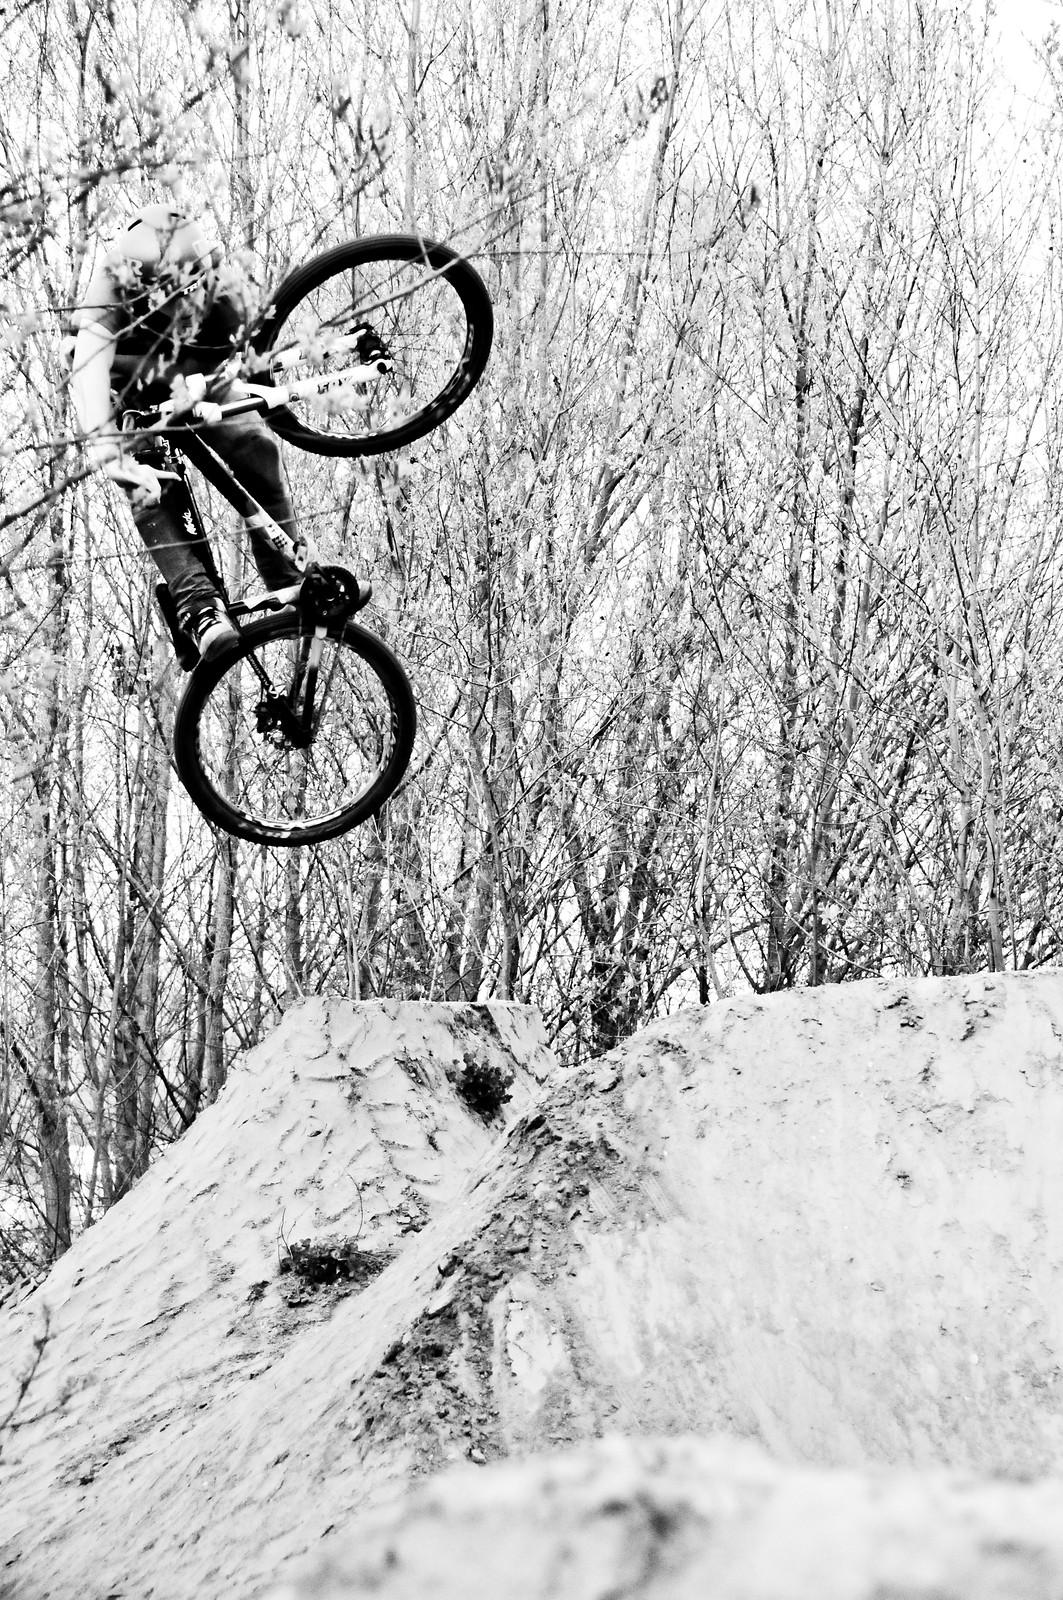 table-hip - MDog - Mountain Biking Pictures - Vital MTB